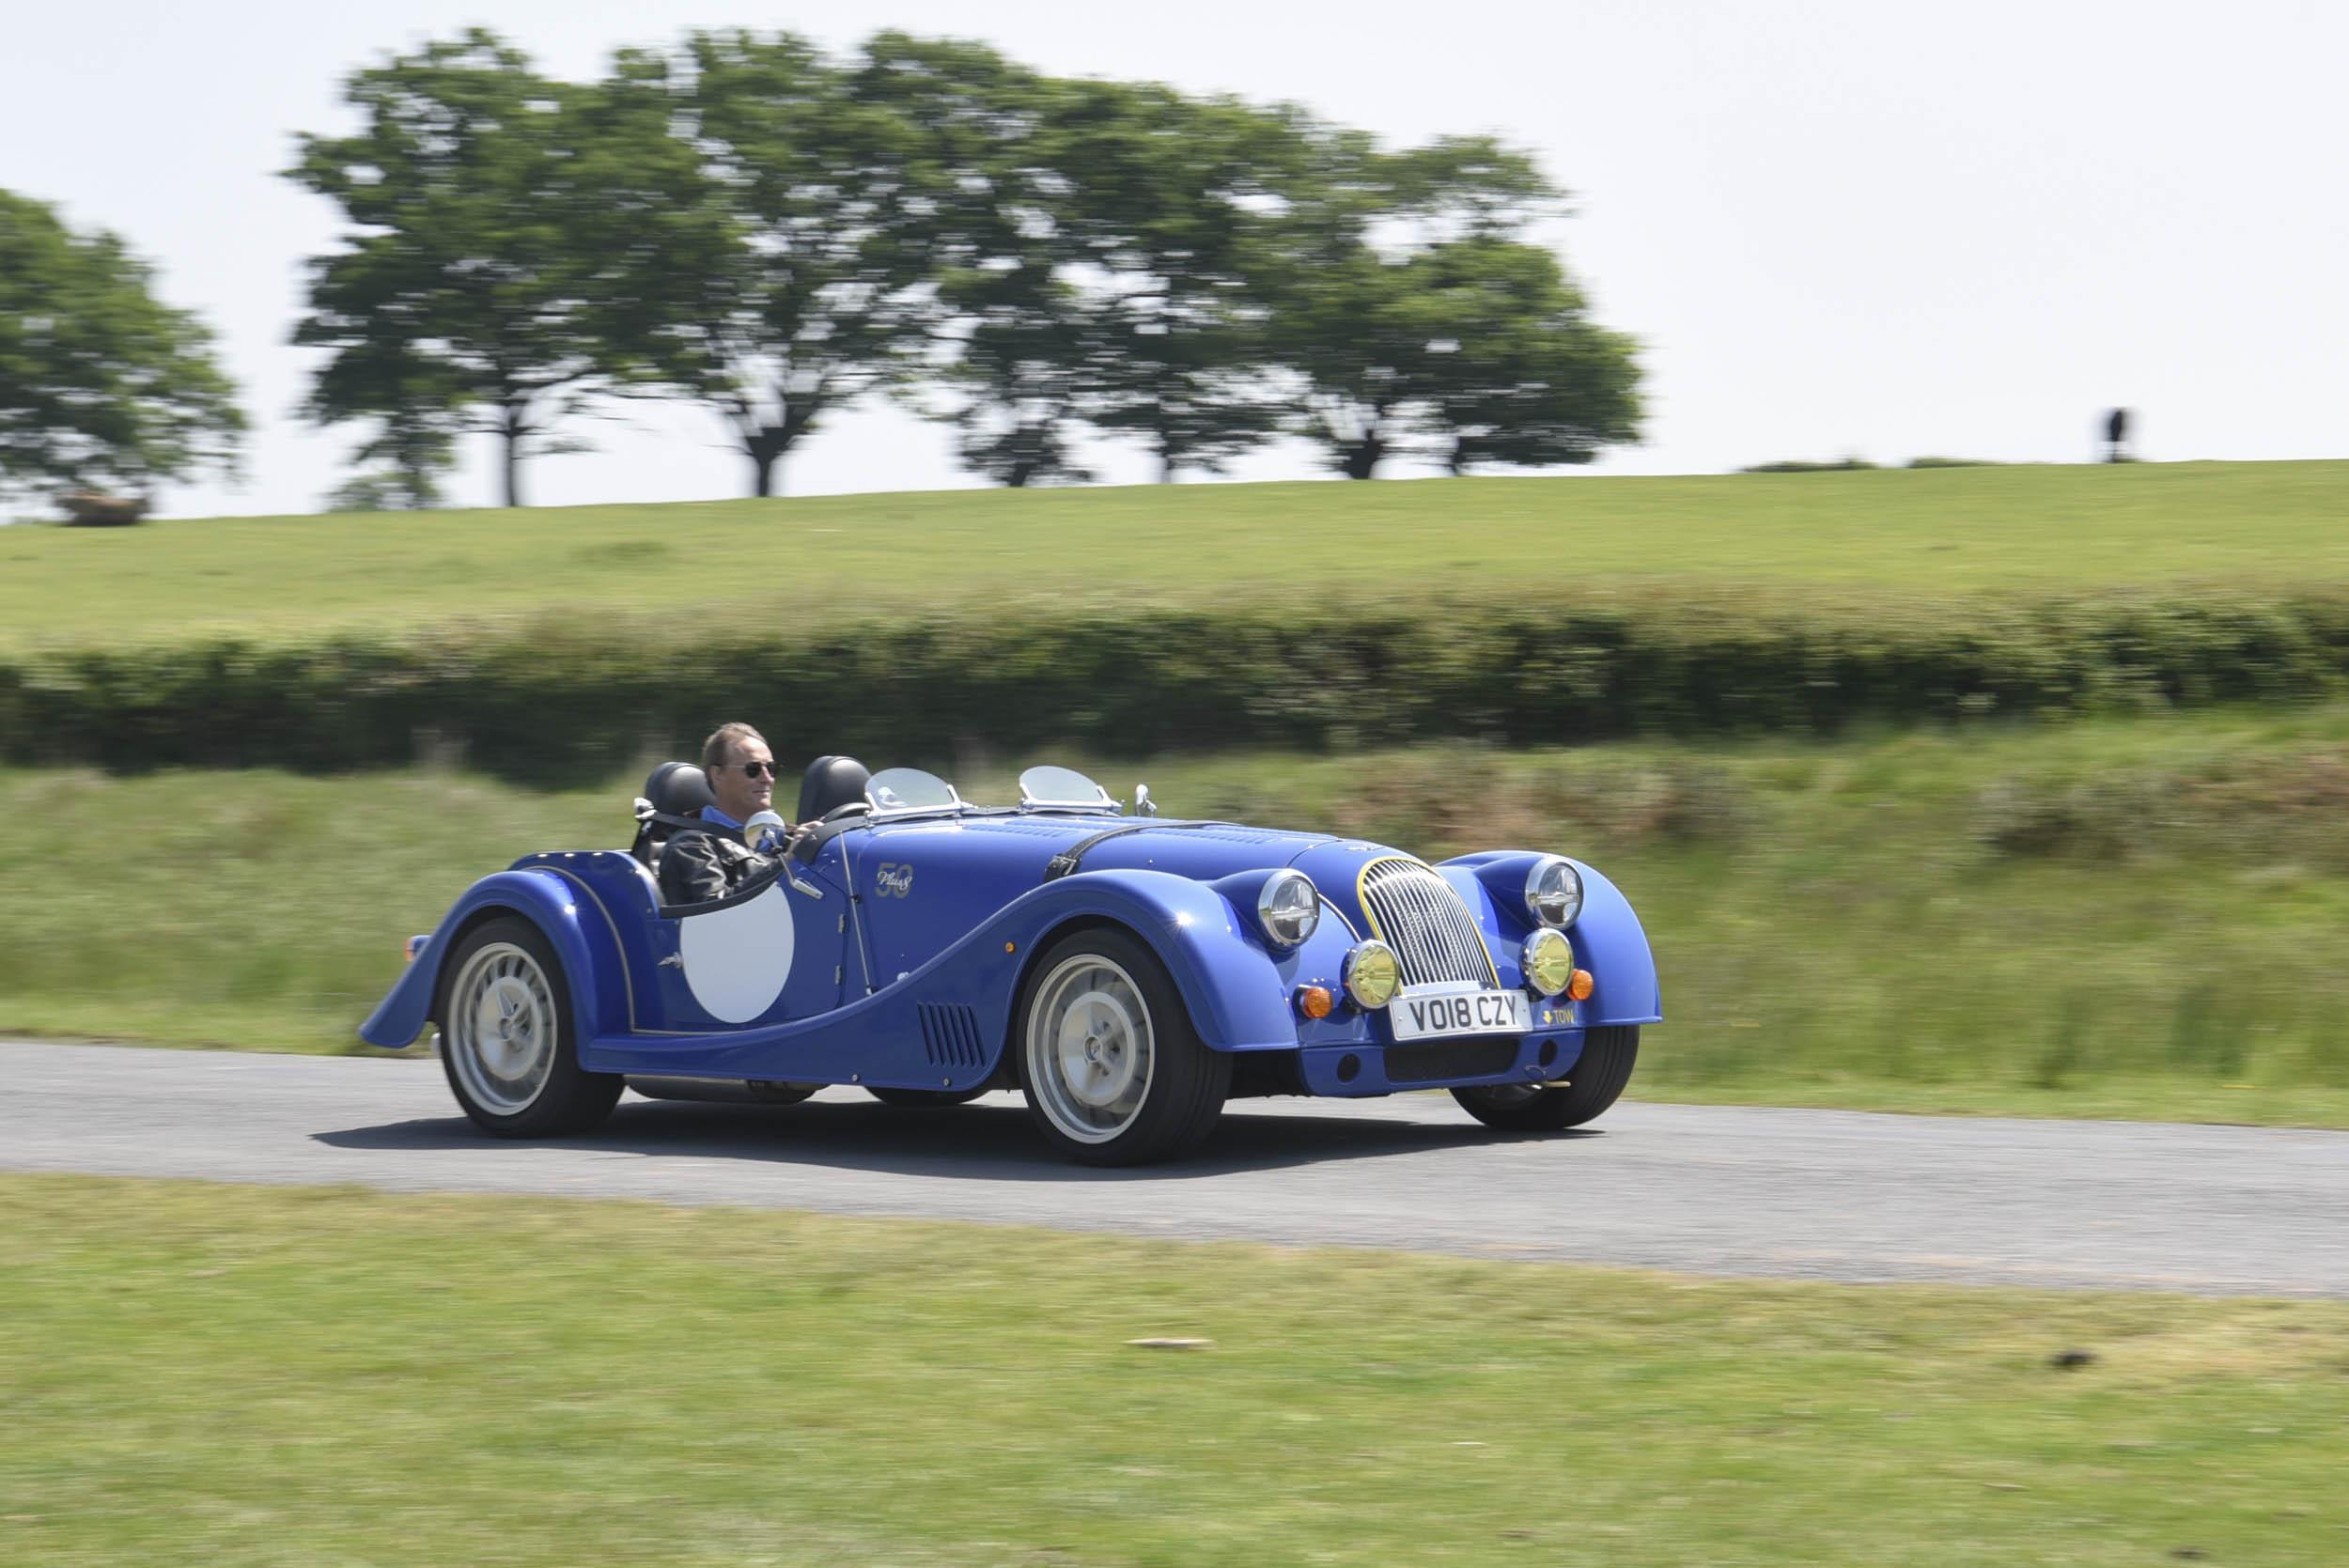 blue Morgan Plus 8 driving